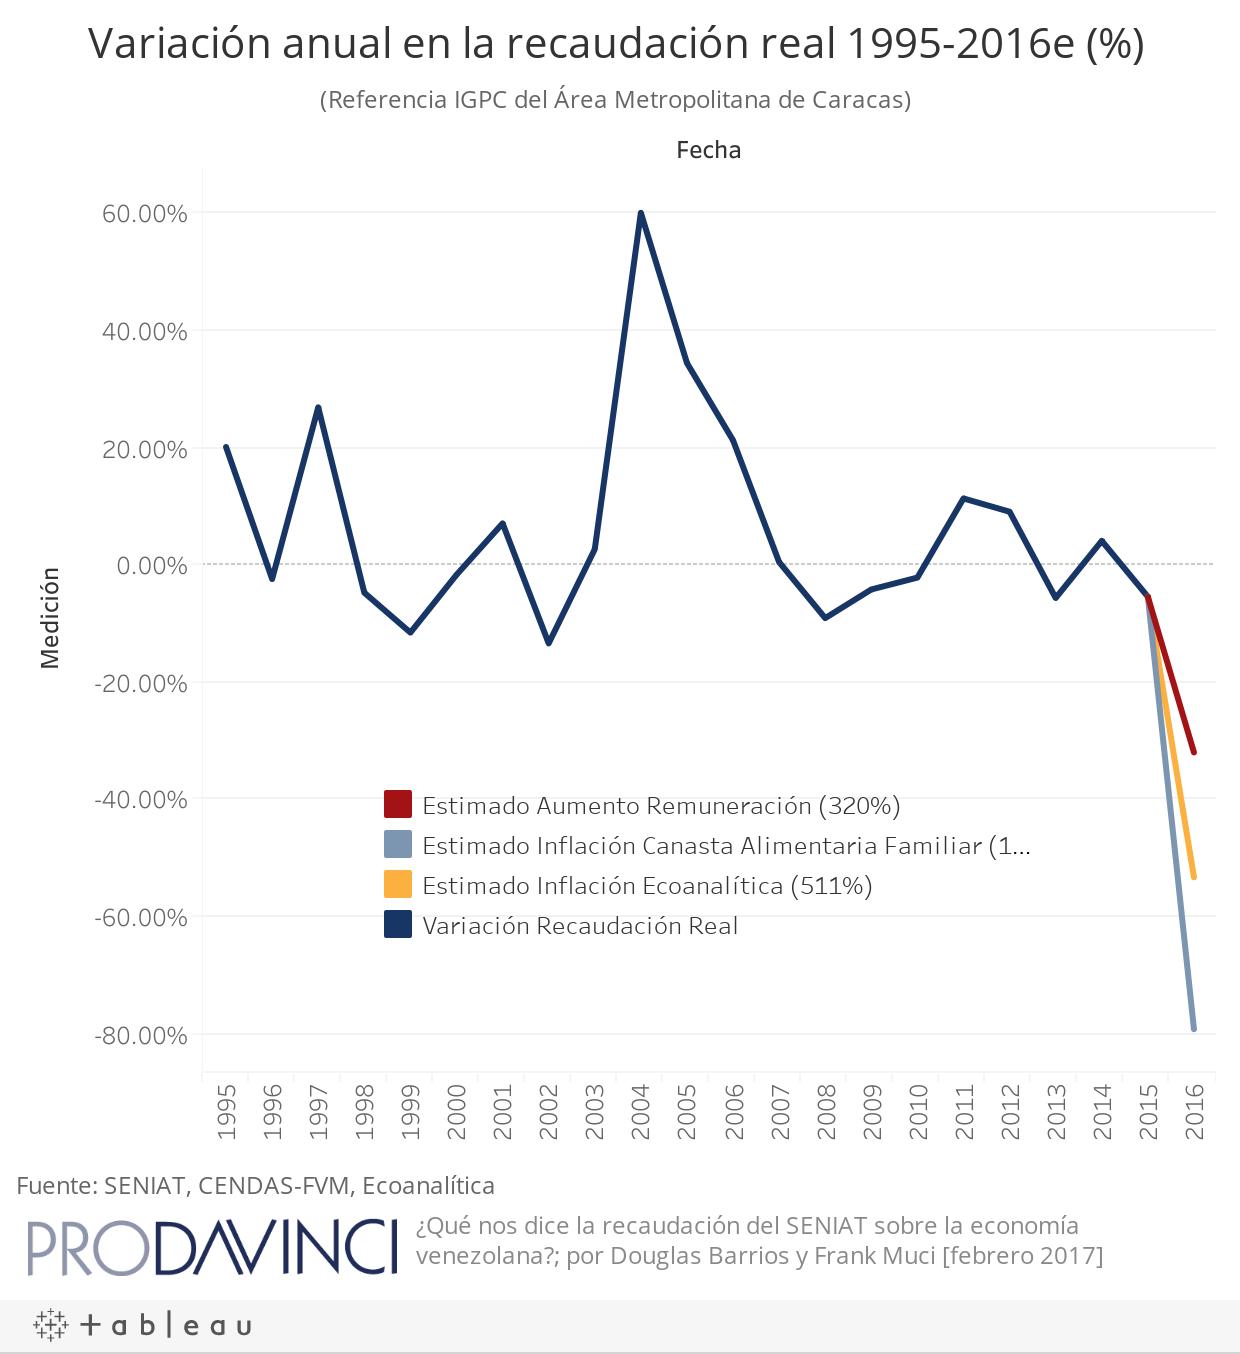 Variación anual en la recaudación real 1995-2016e(%)